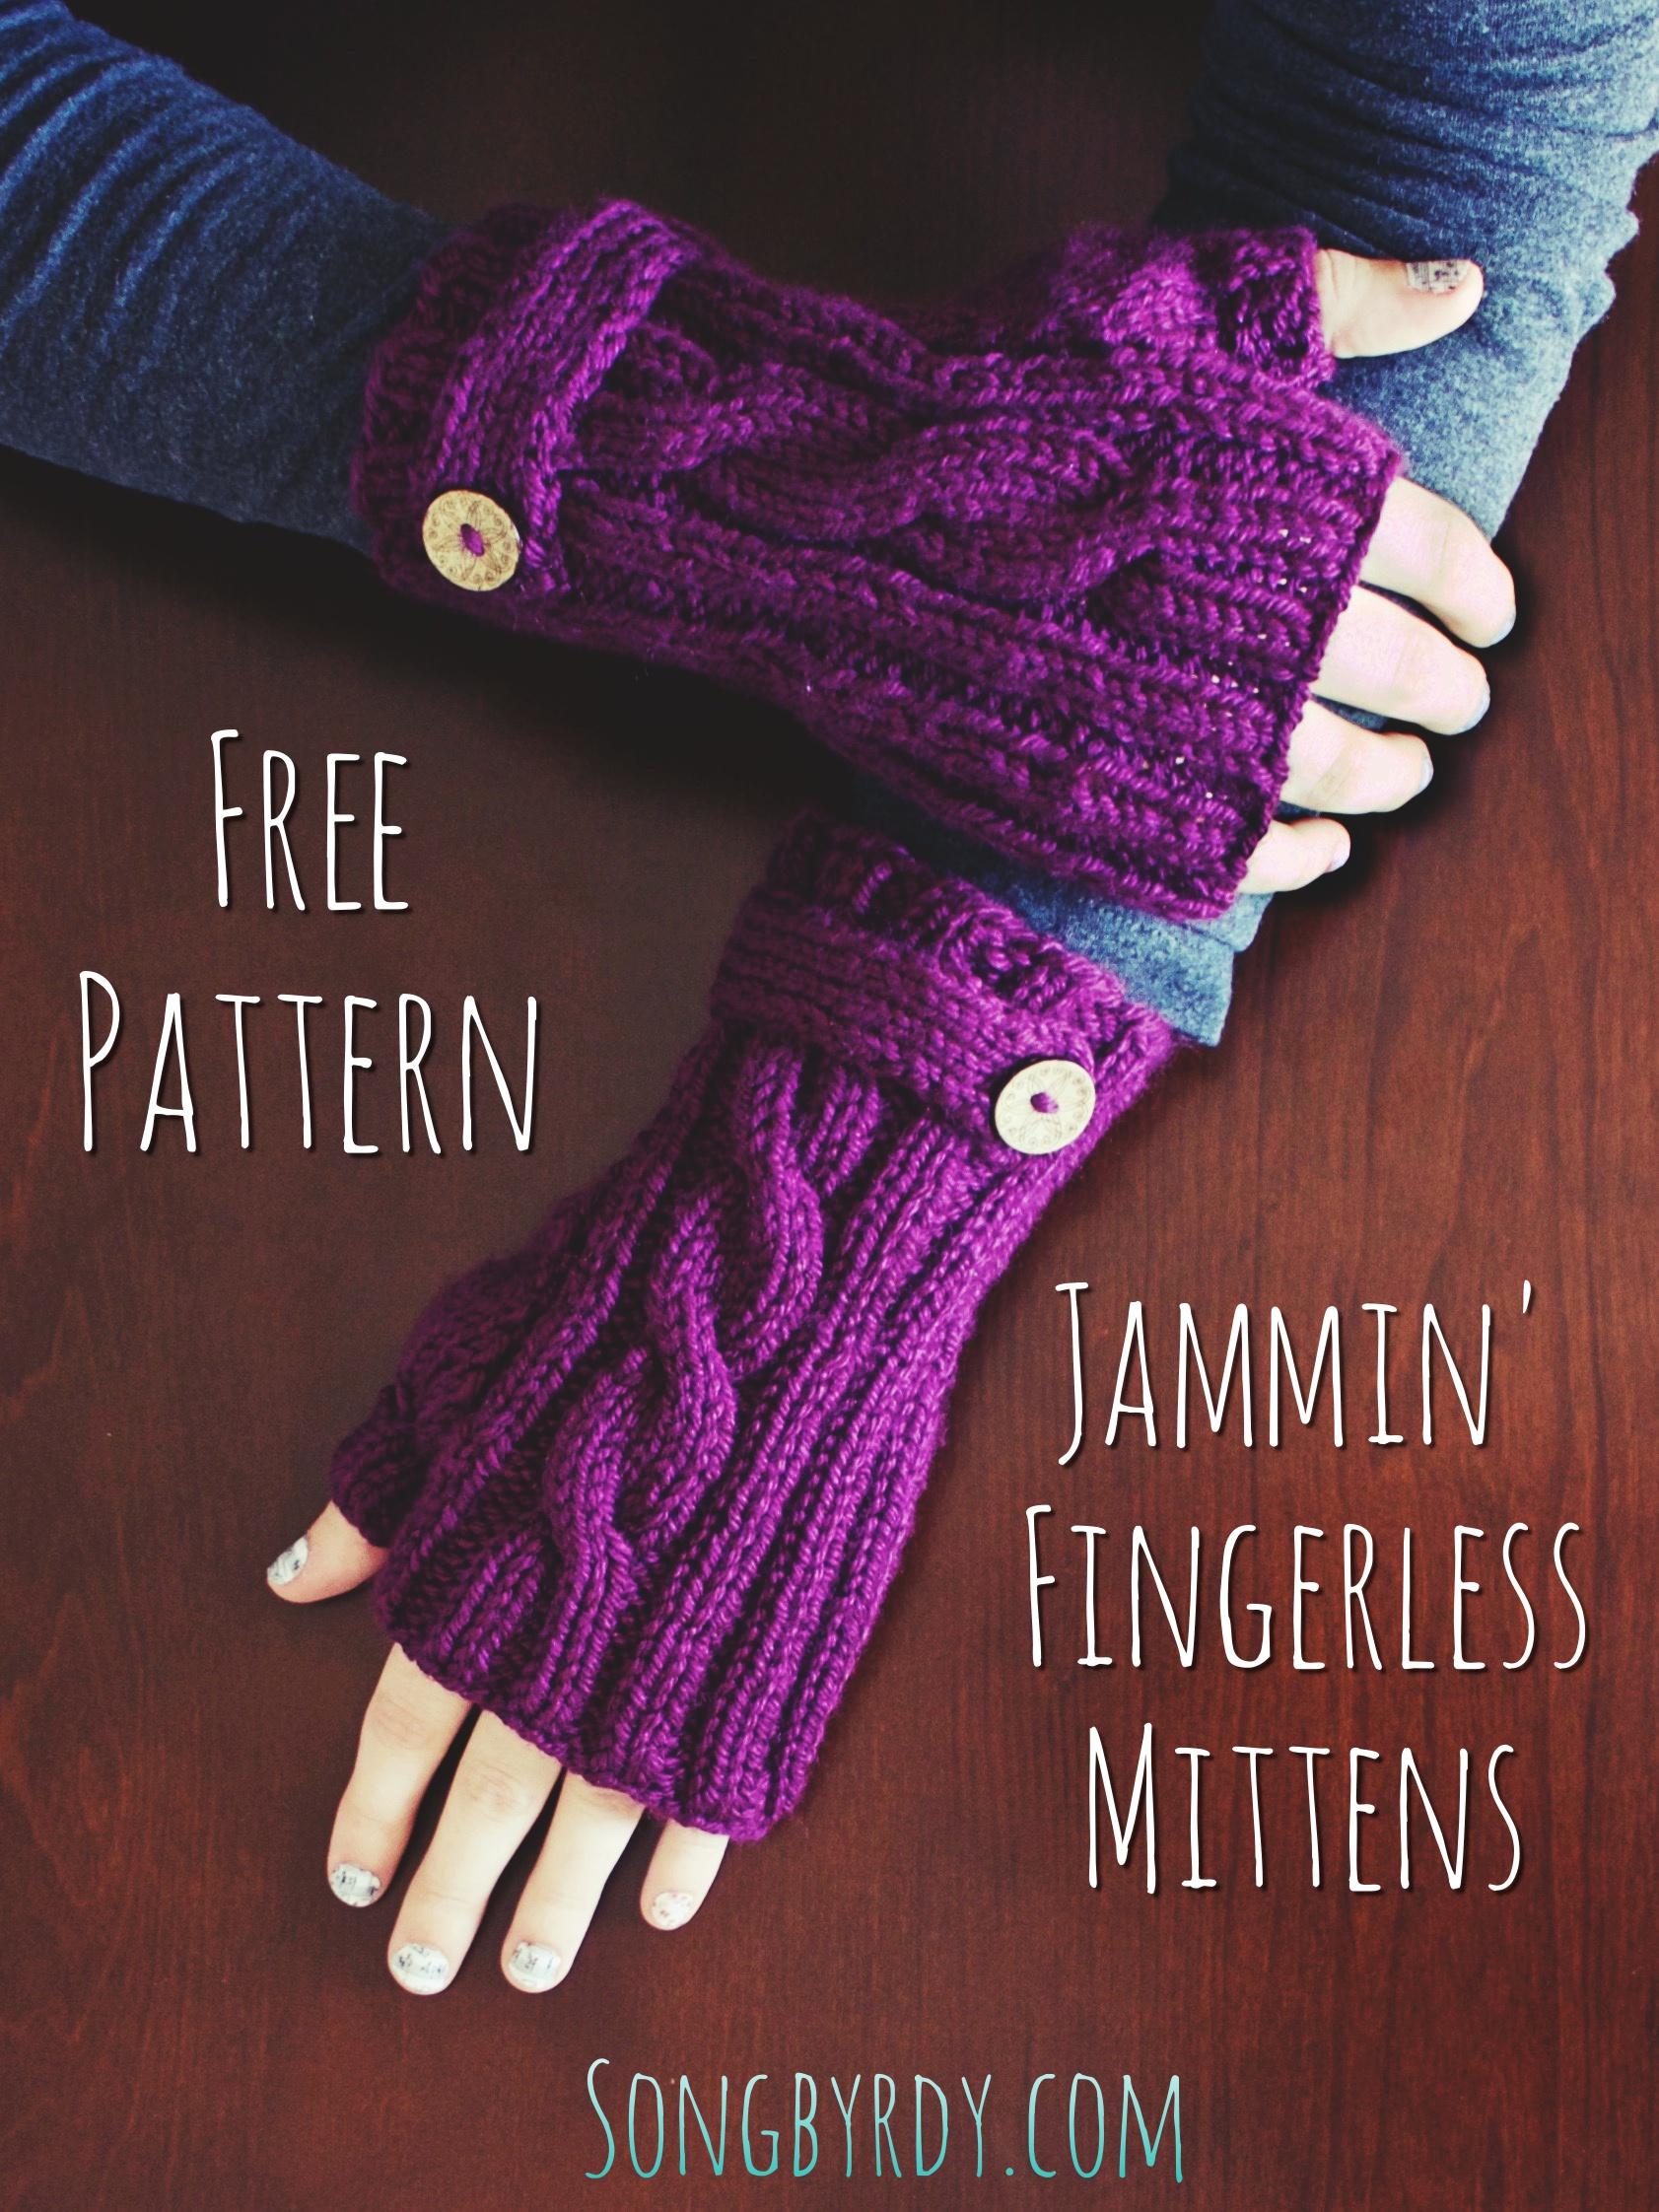 Free Knitting Pattern | Jammin\' Fingerless Mittens